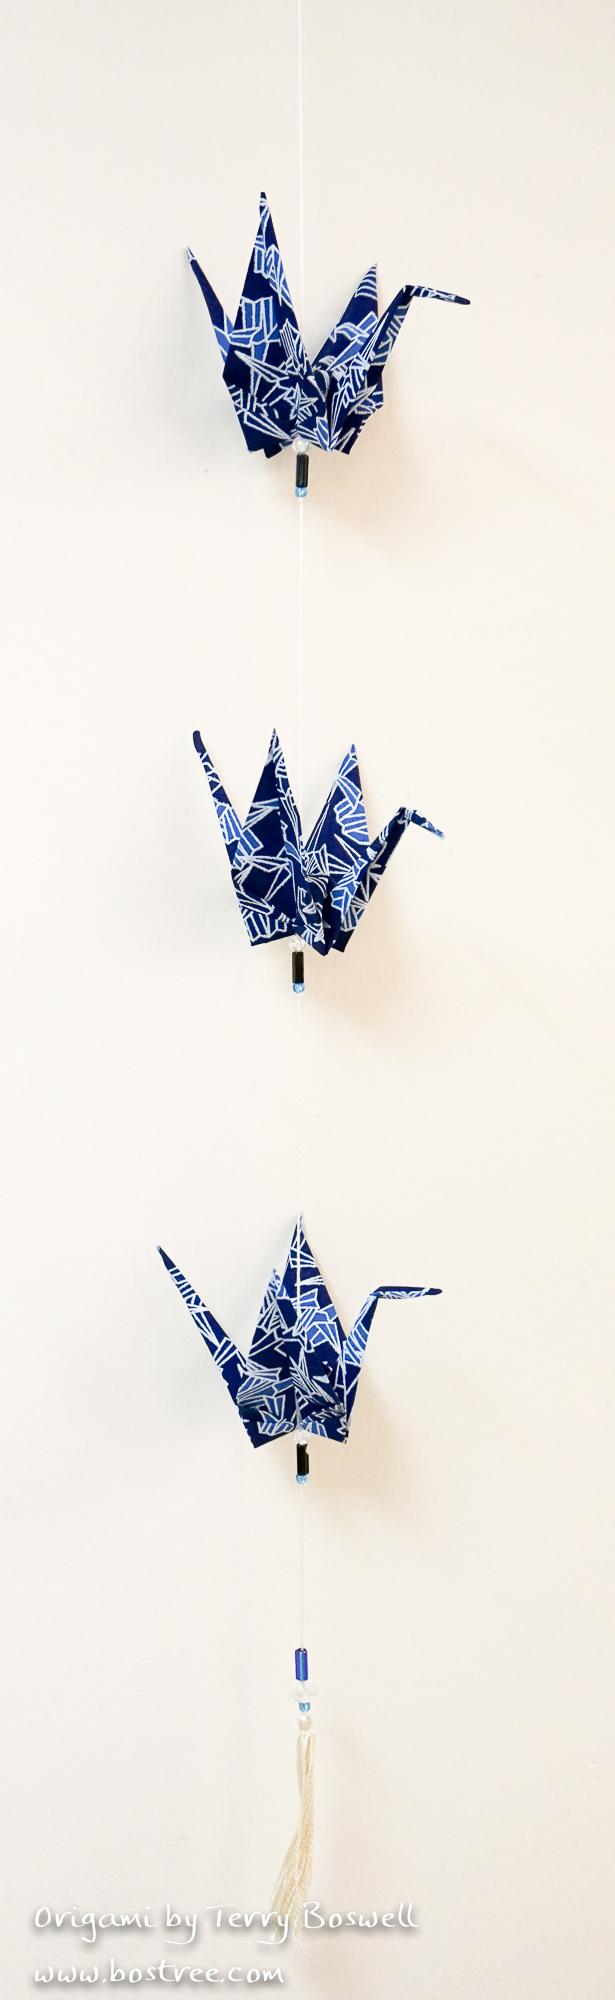 Three Crane Origami Mobile - Dark Blue, Light Blue, White OR00032